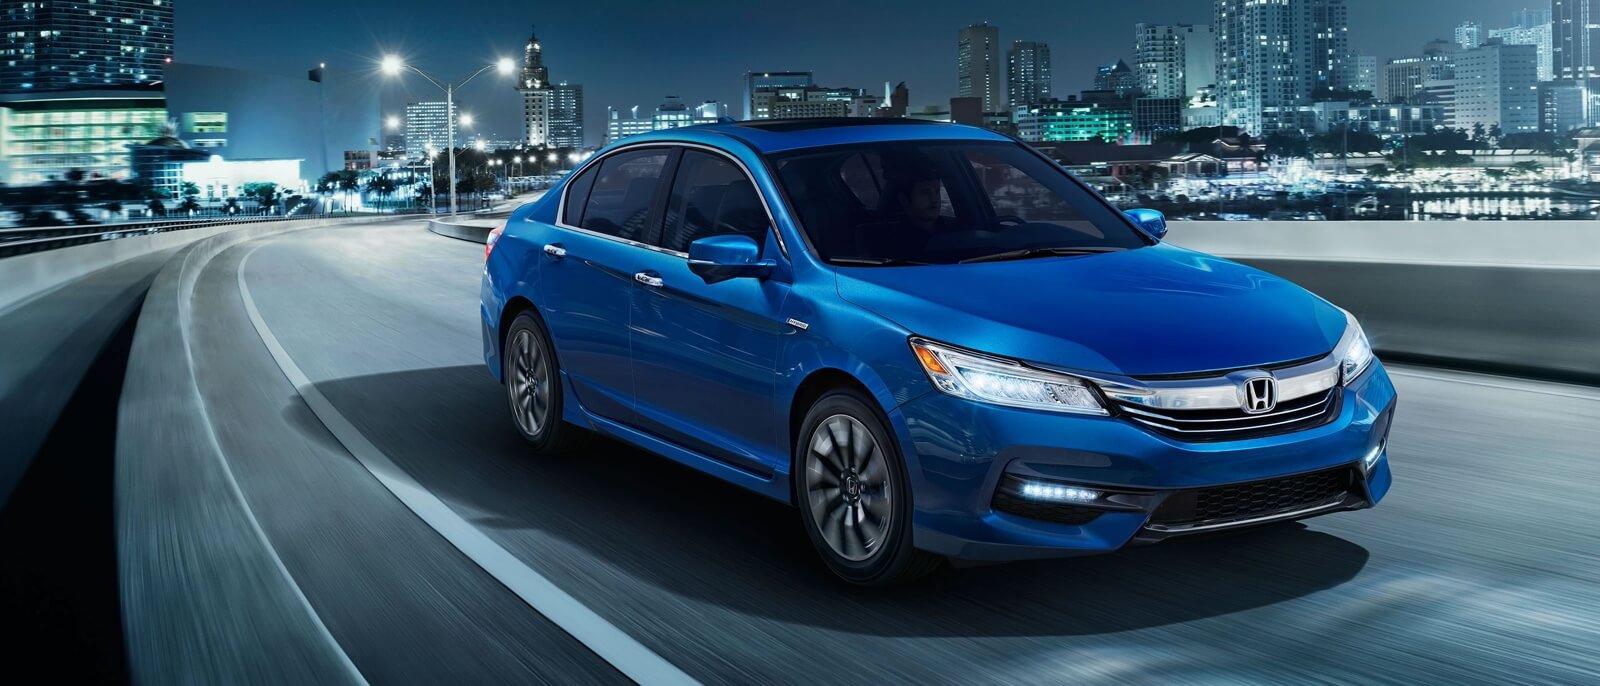 2017 Honda Accord Hybrid blue exterior